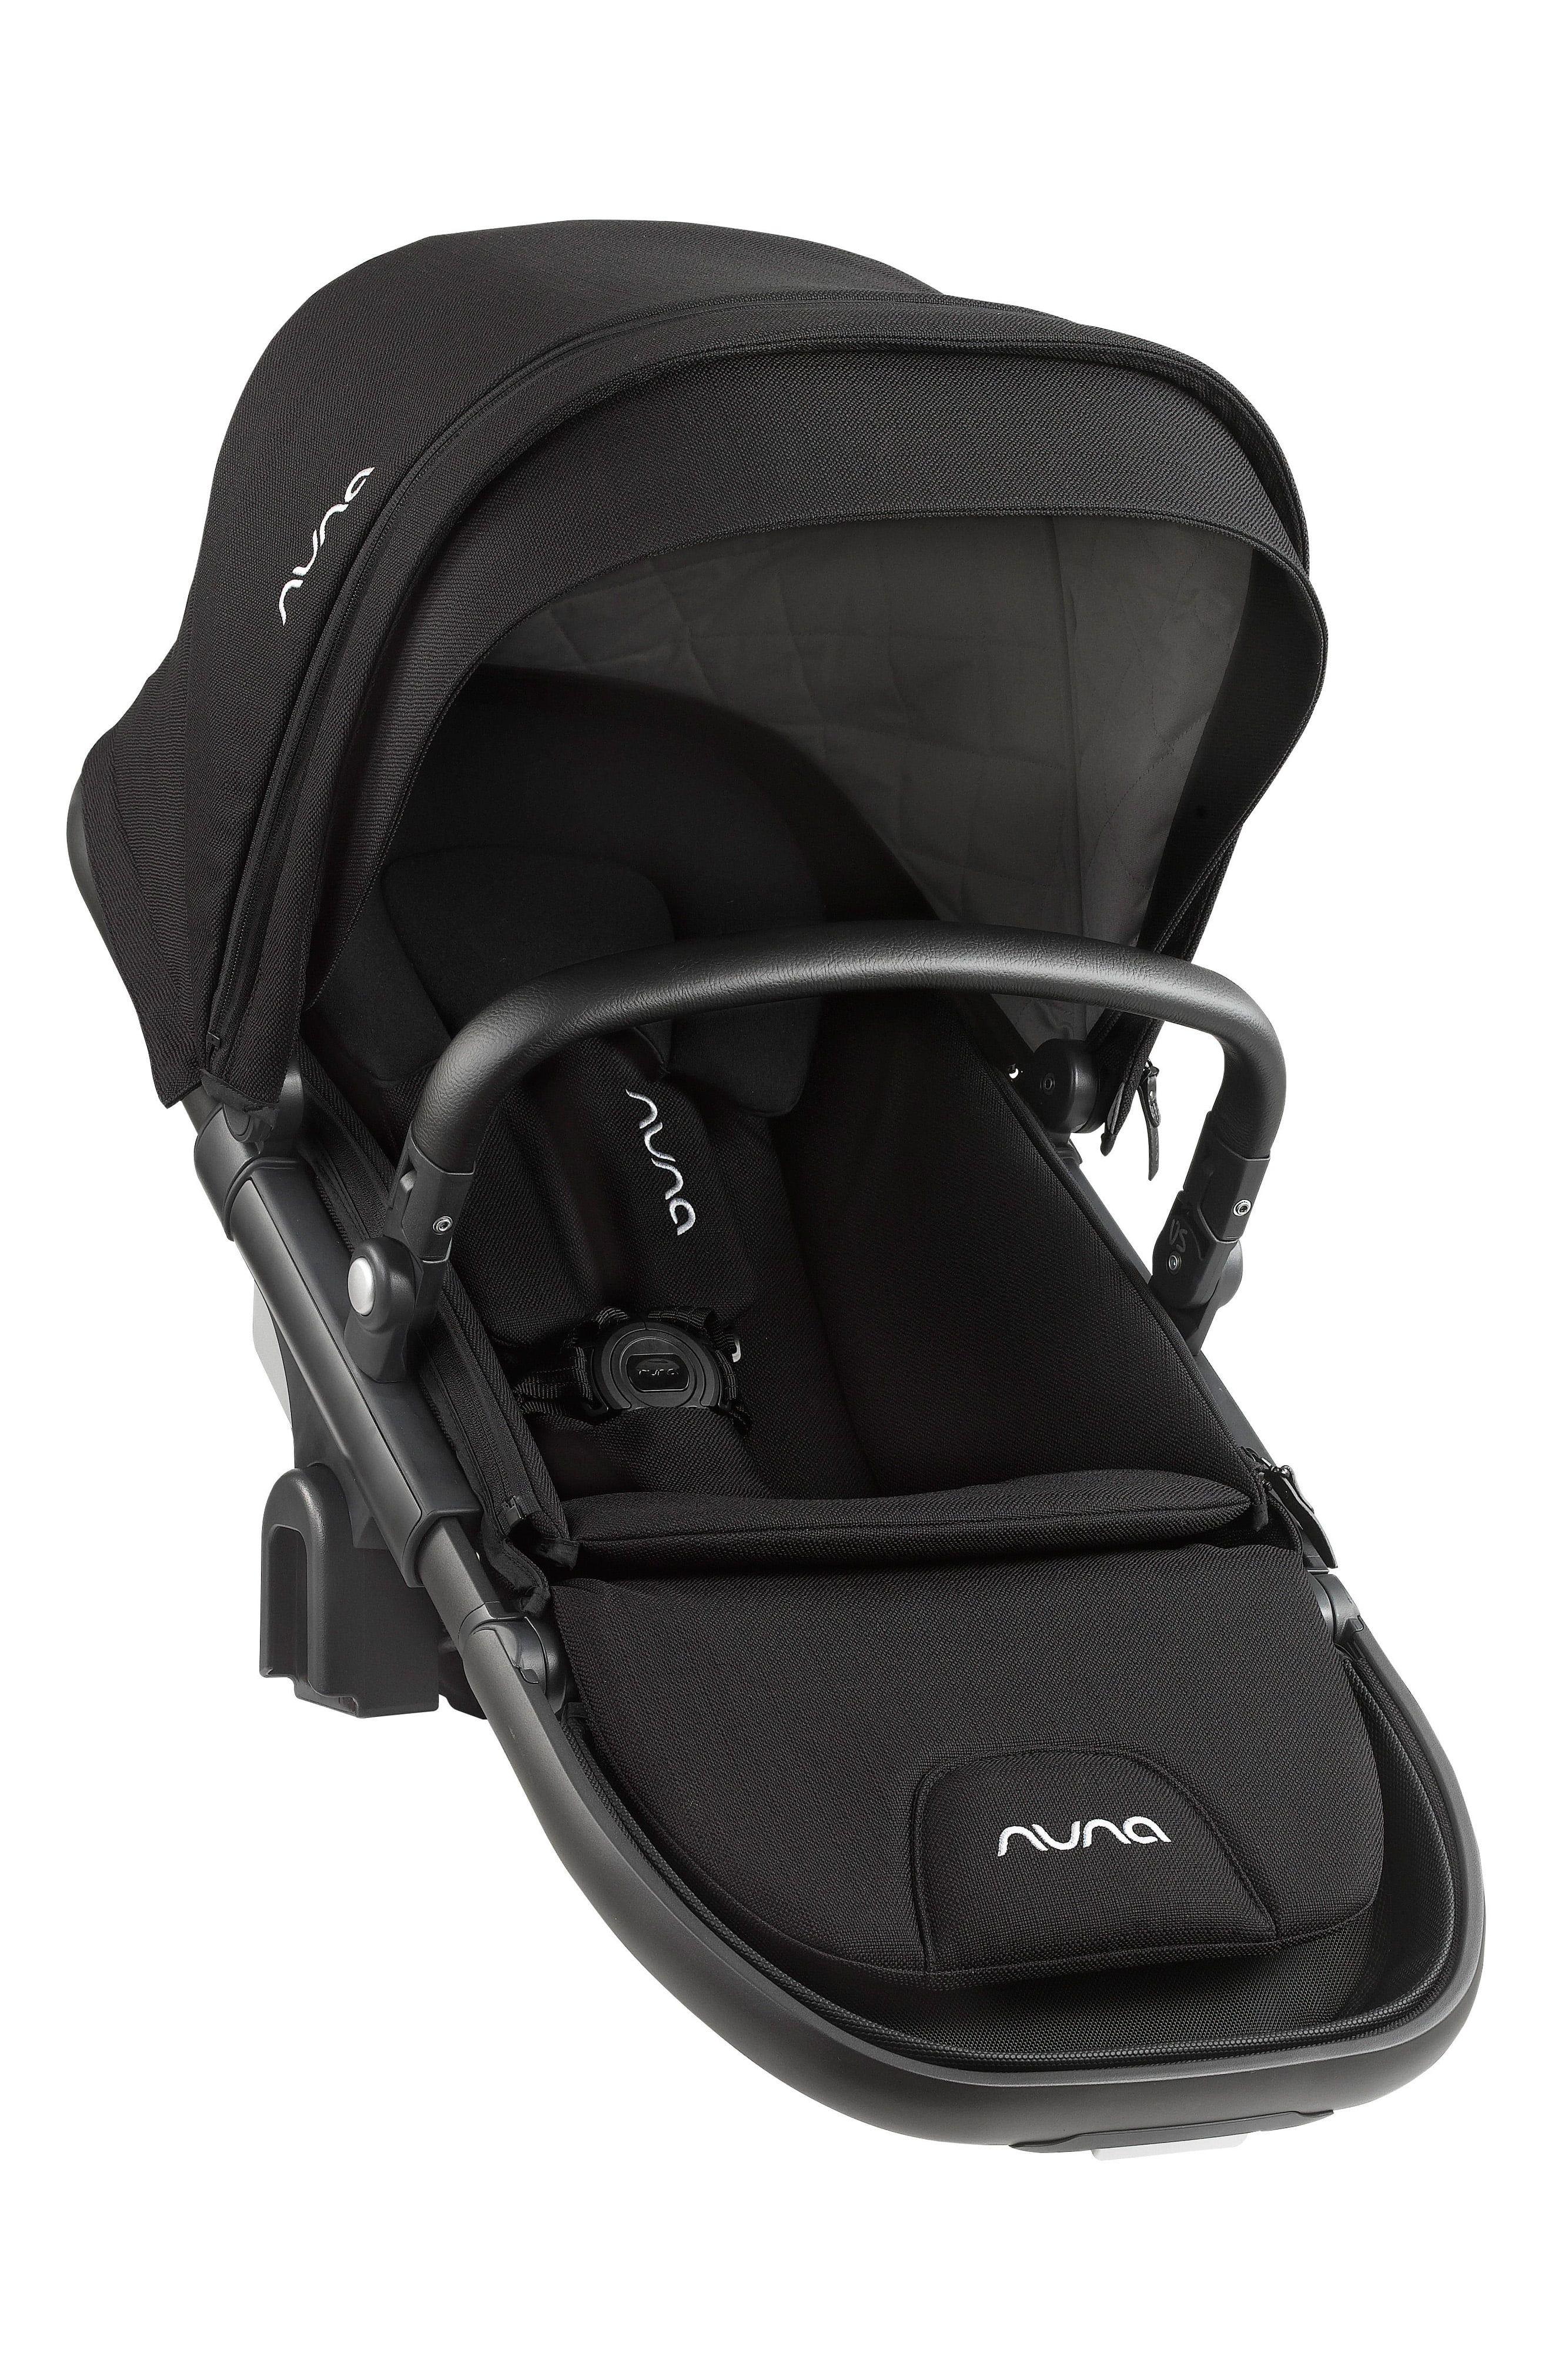 Nuna Travel Bag fits Nuna Pushchair and Strollers Accessory